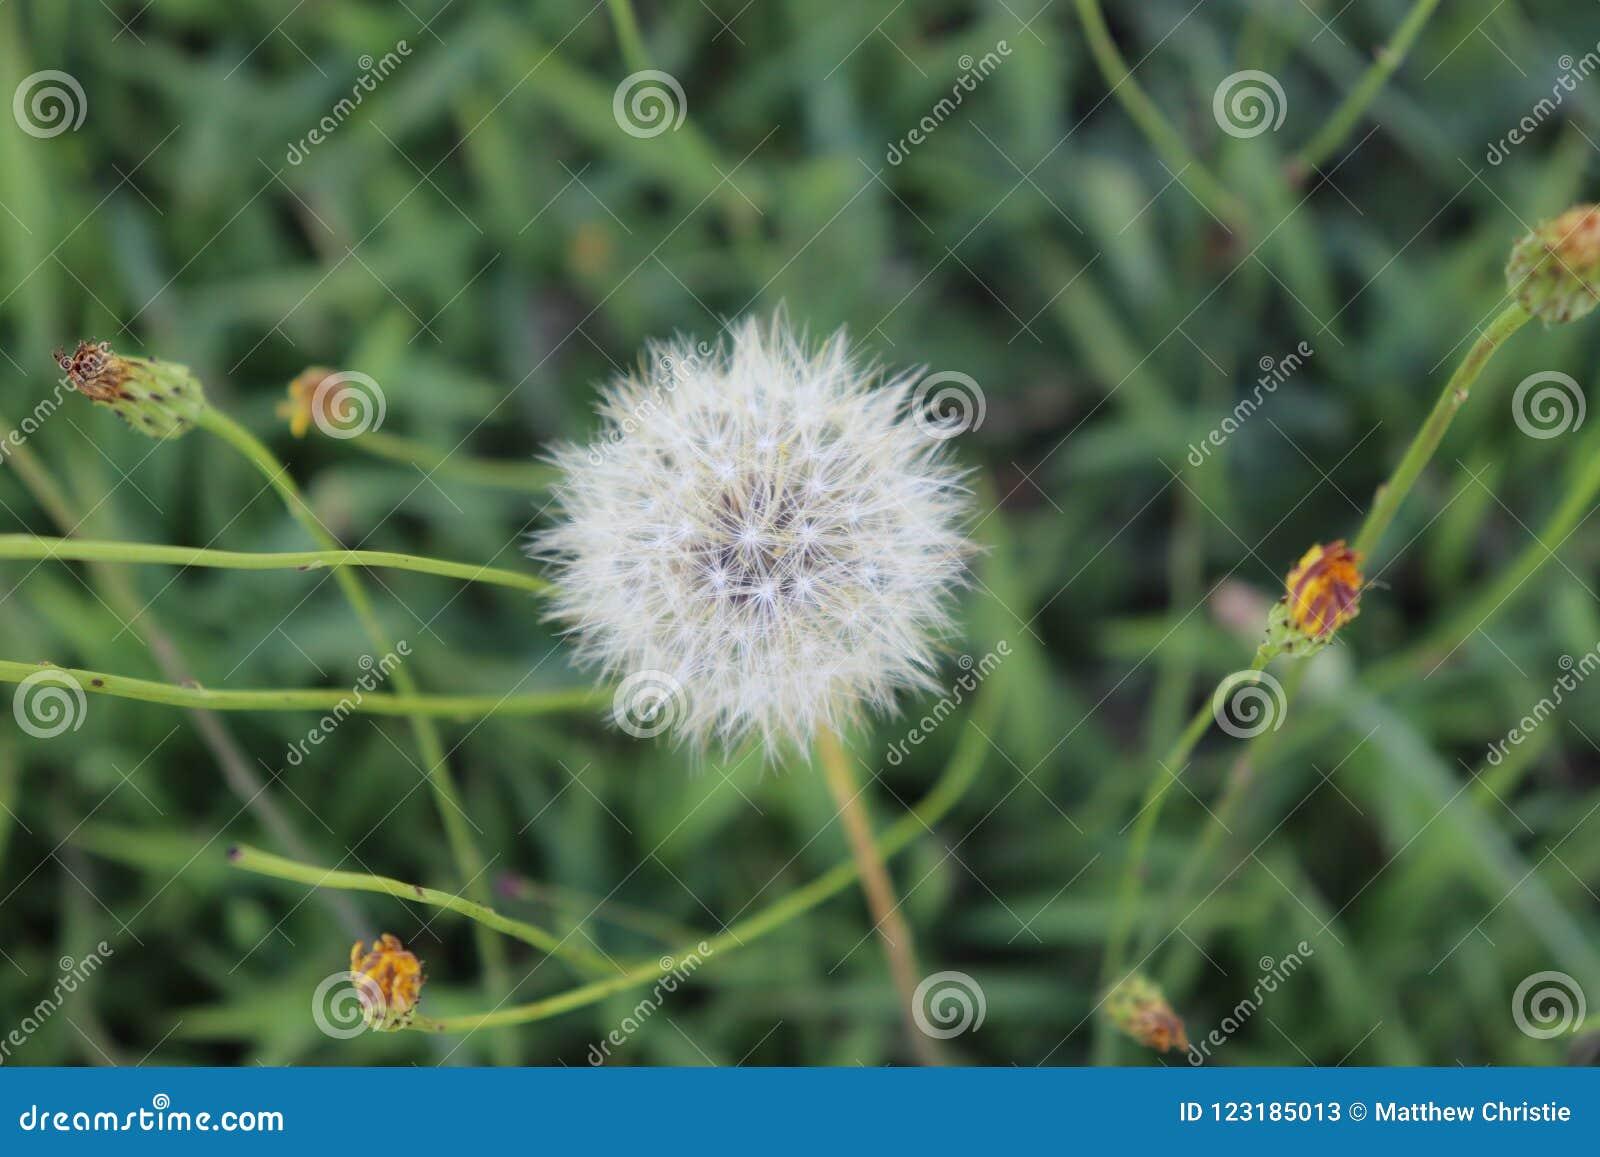 Dandelion, Dead, White, Grass, Outside